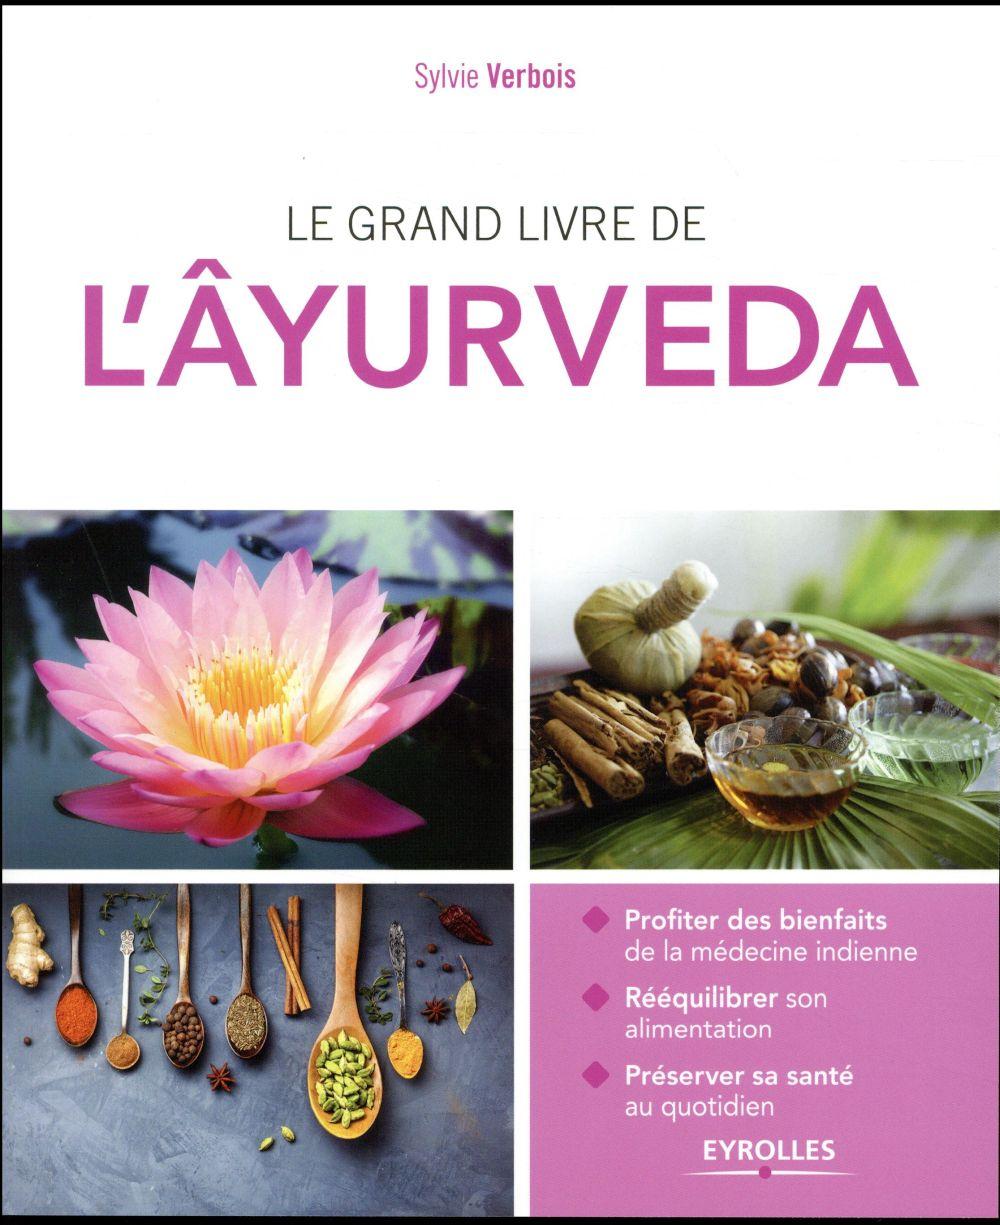 LE GRAND LIVRE DE L'AYURVEDA - PROFITER DES BIENFAITS DE LA MEDECINE INDIENNE REEQUILIBRER SON ALIME